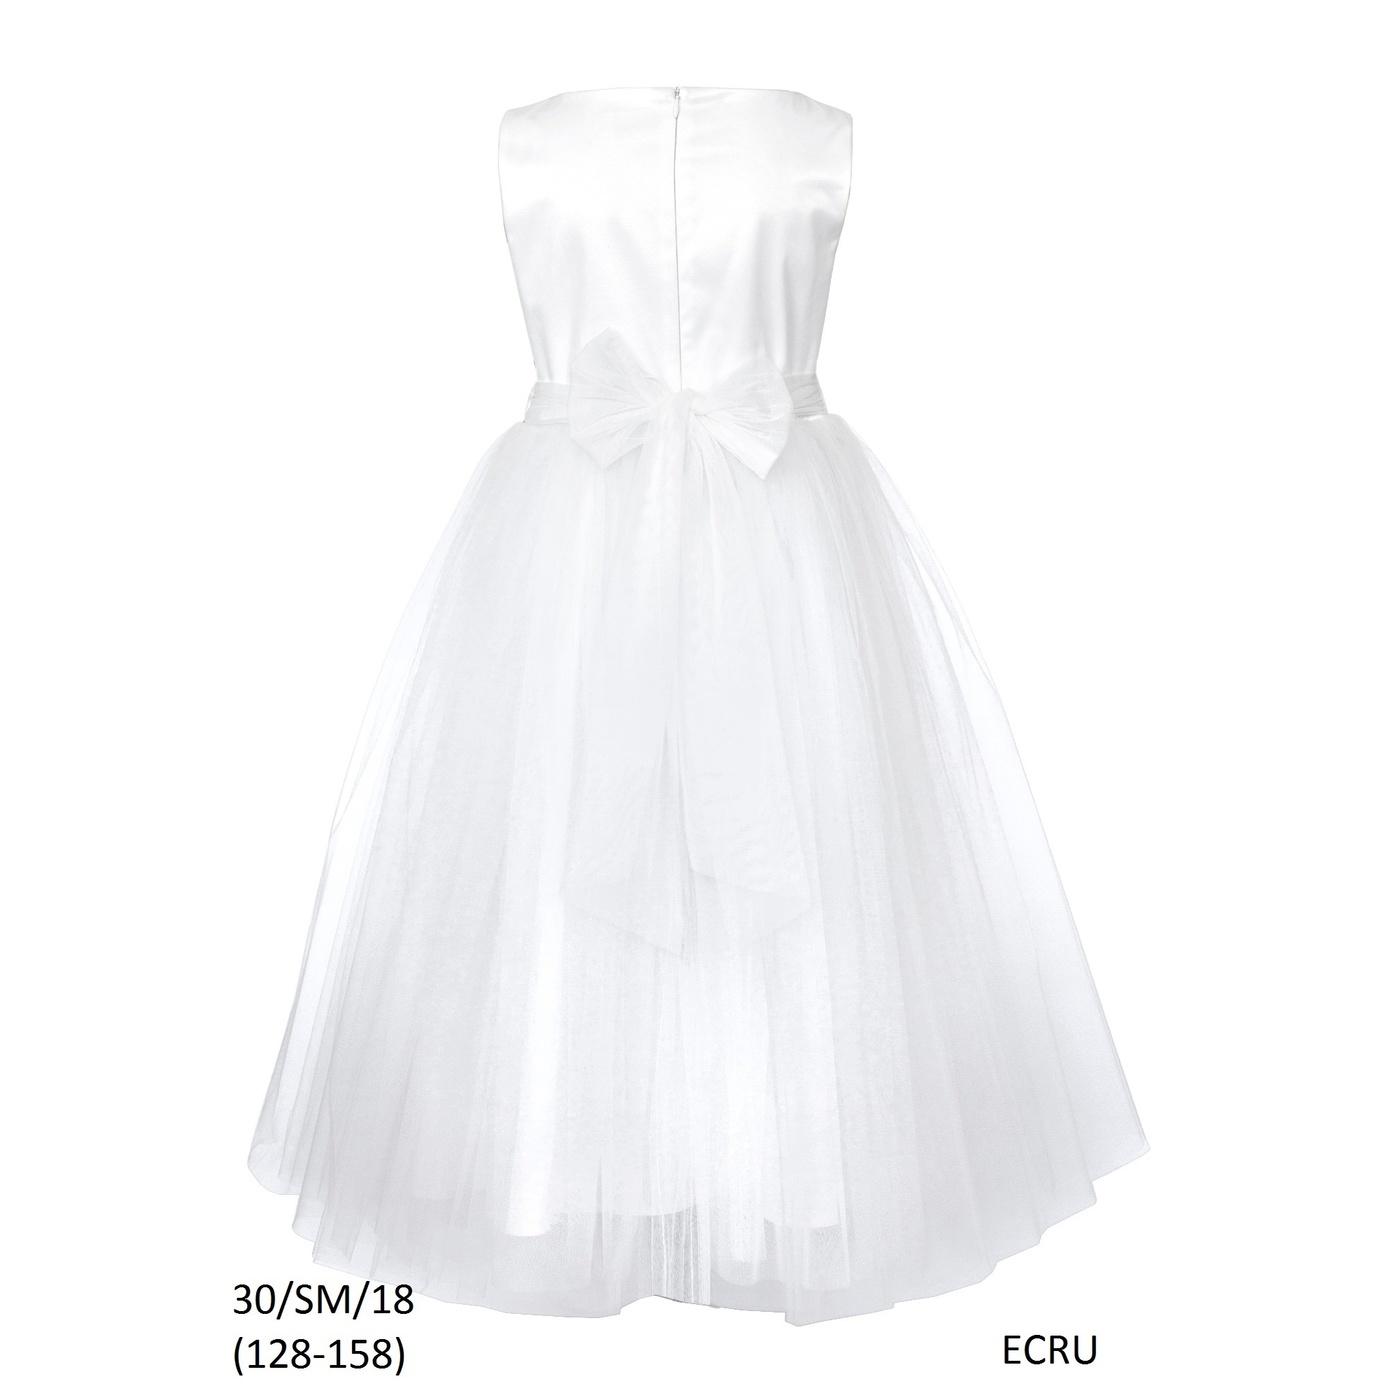 269082e150 ... Sukienka 30 SM 18 na przebranie po komunii SLY